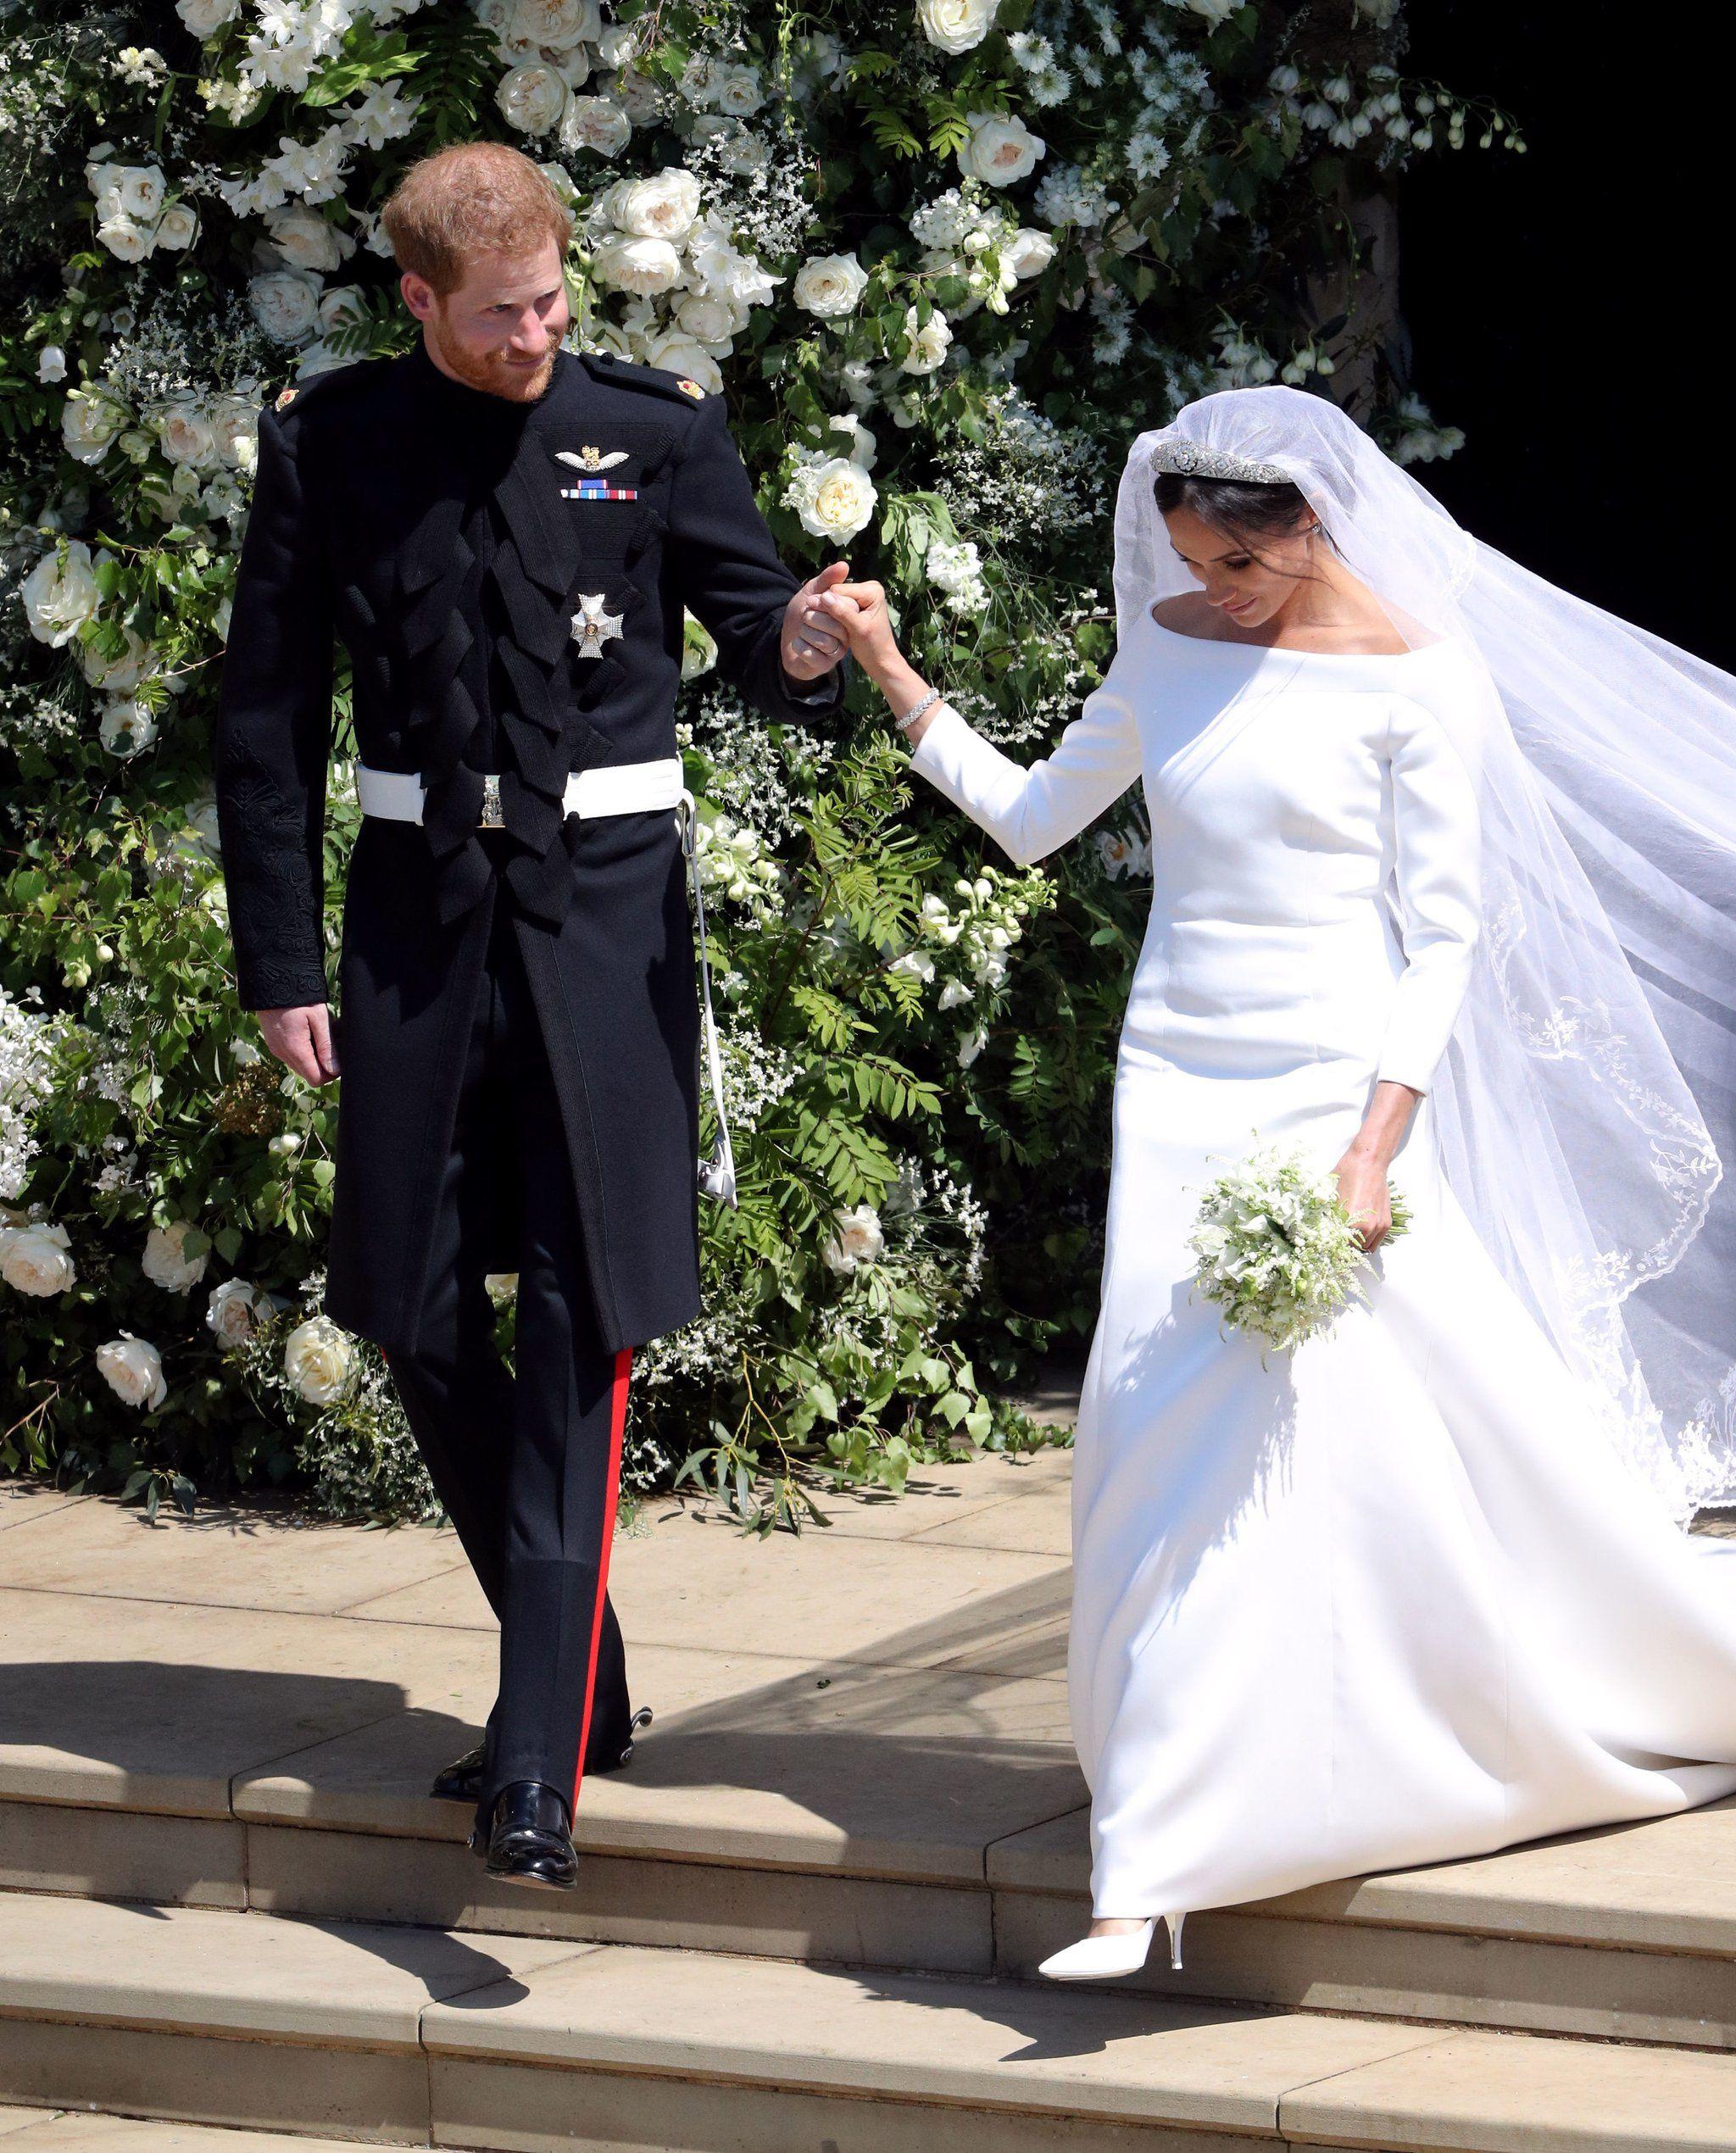 Meghan Markle's Breathtaking Wedding Dress Surpassed All